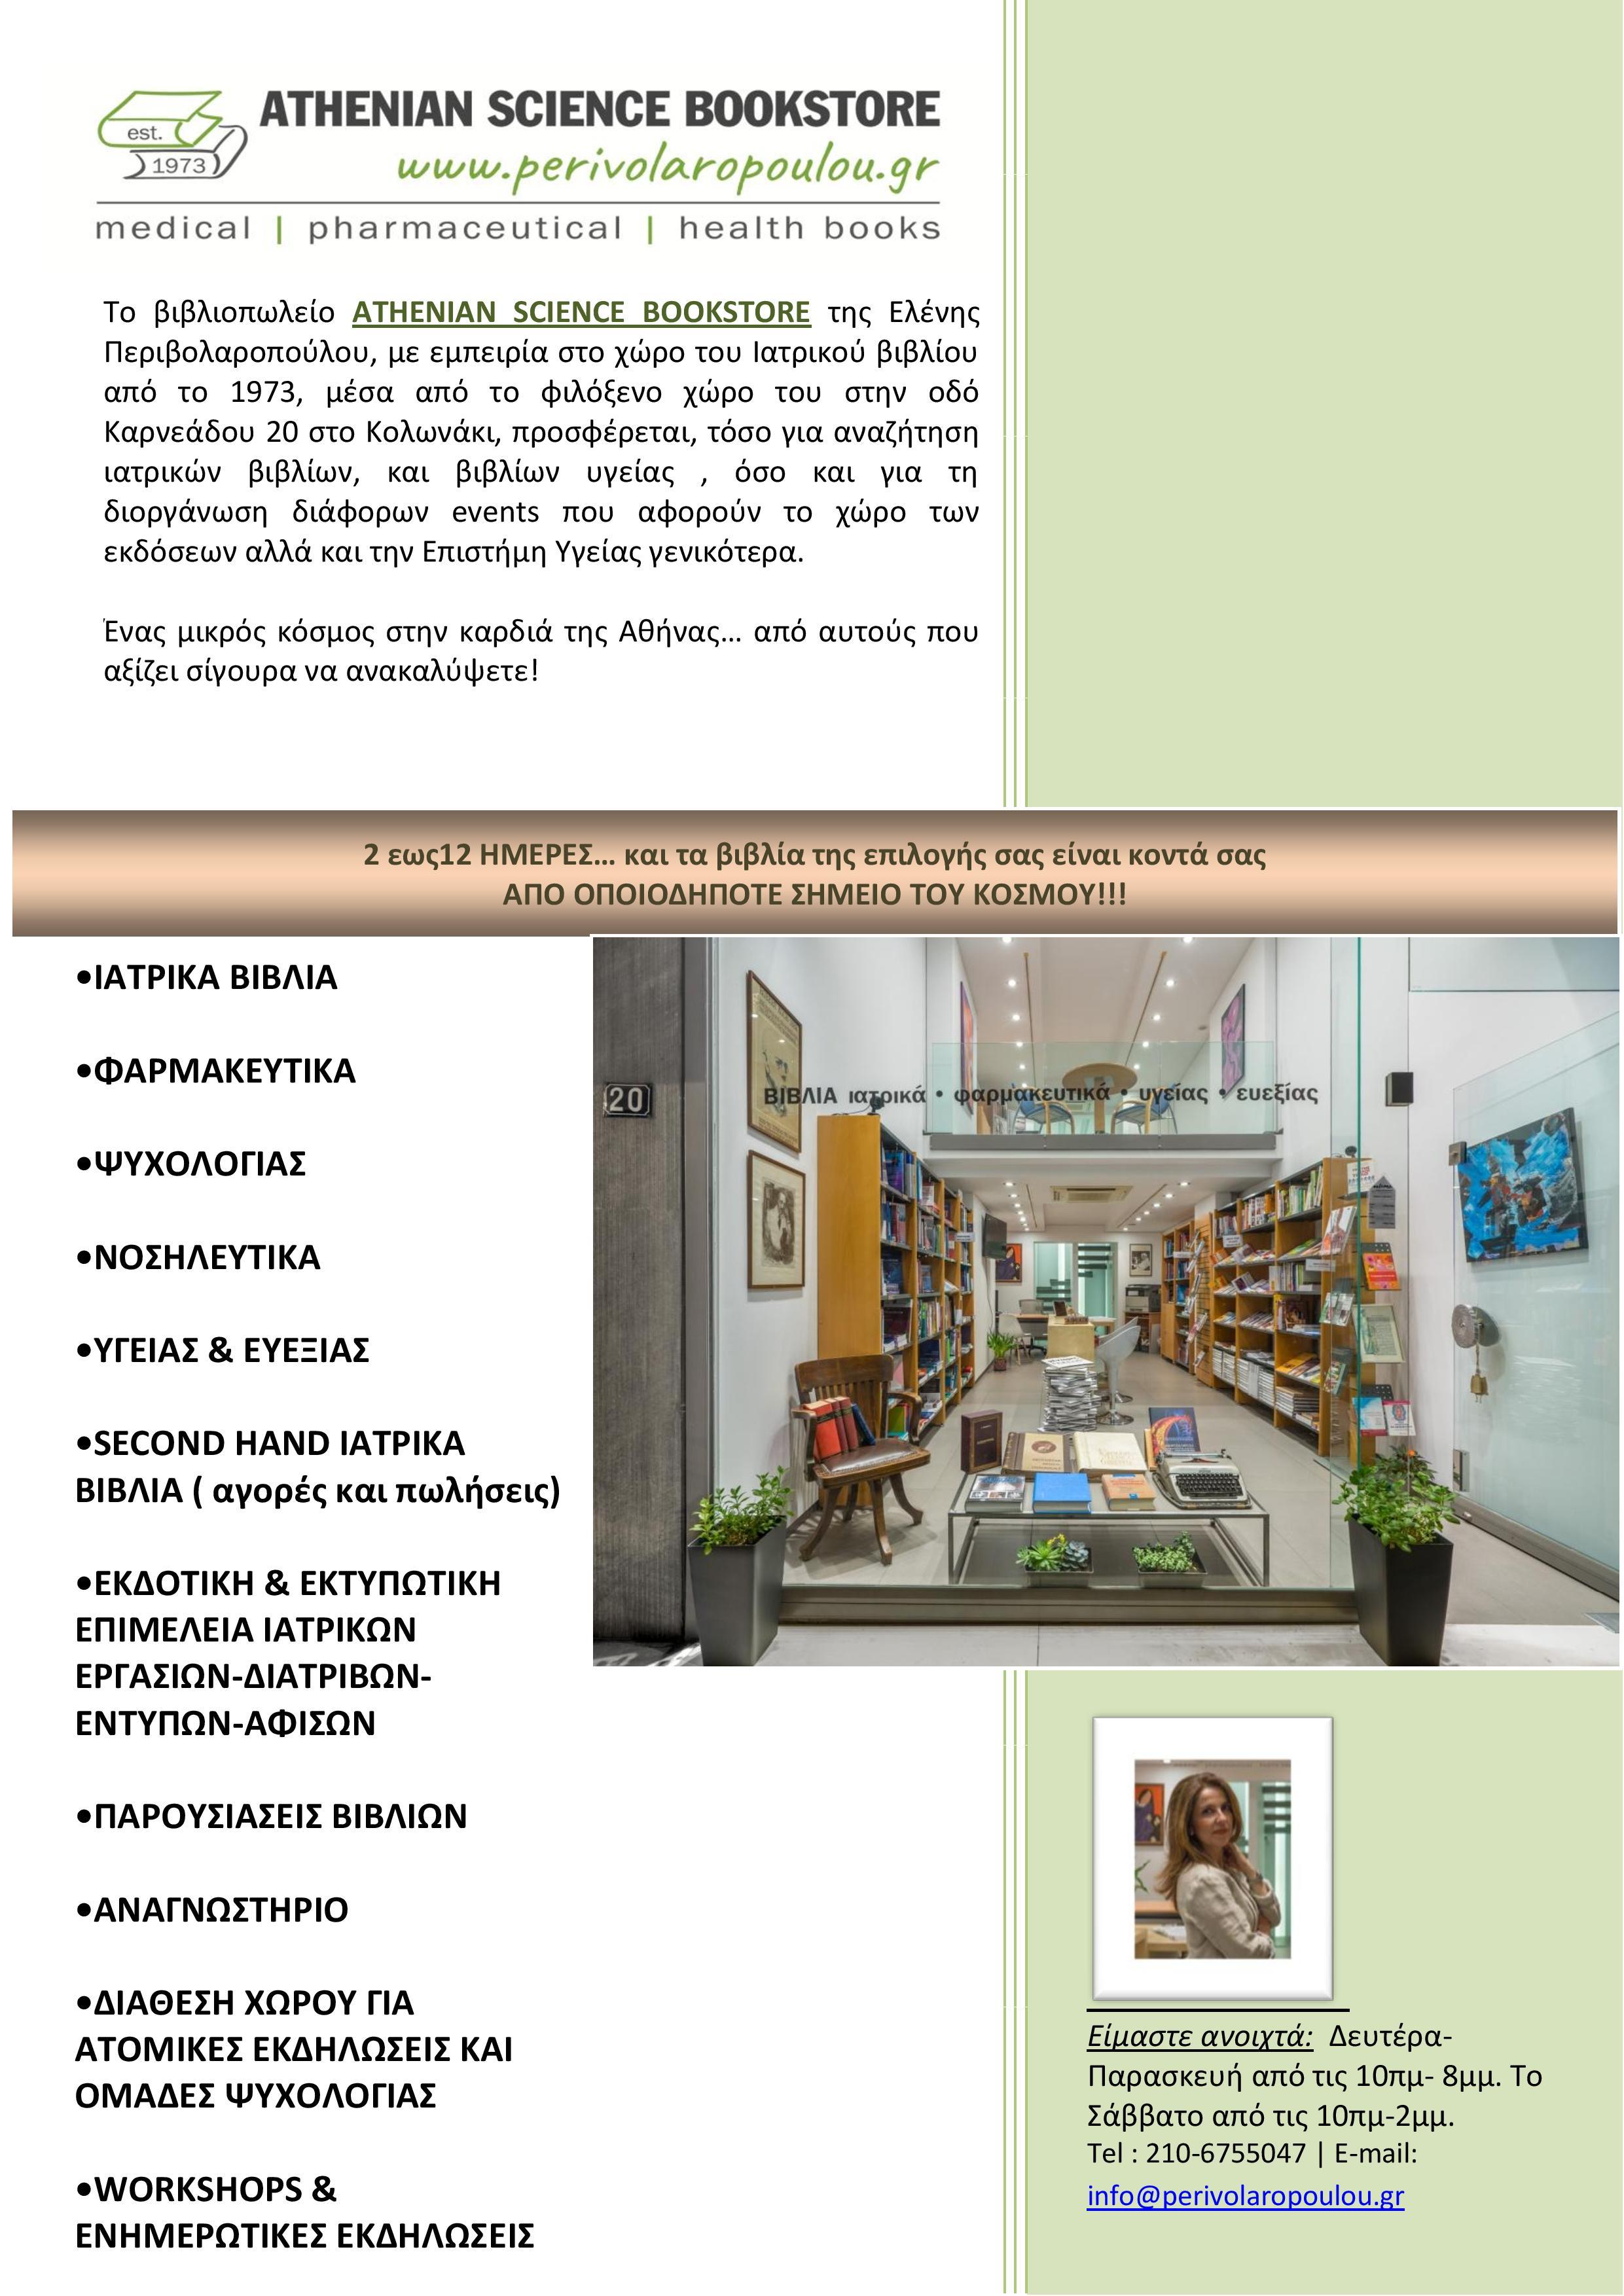 Athenian Science Bookstore - Perivolaropoulou